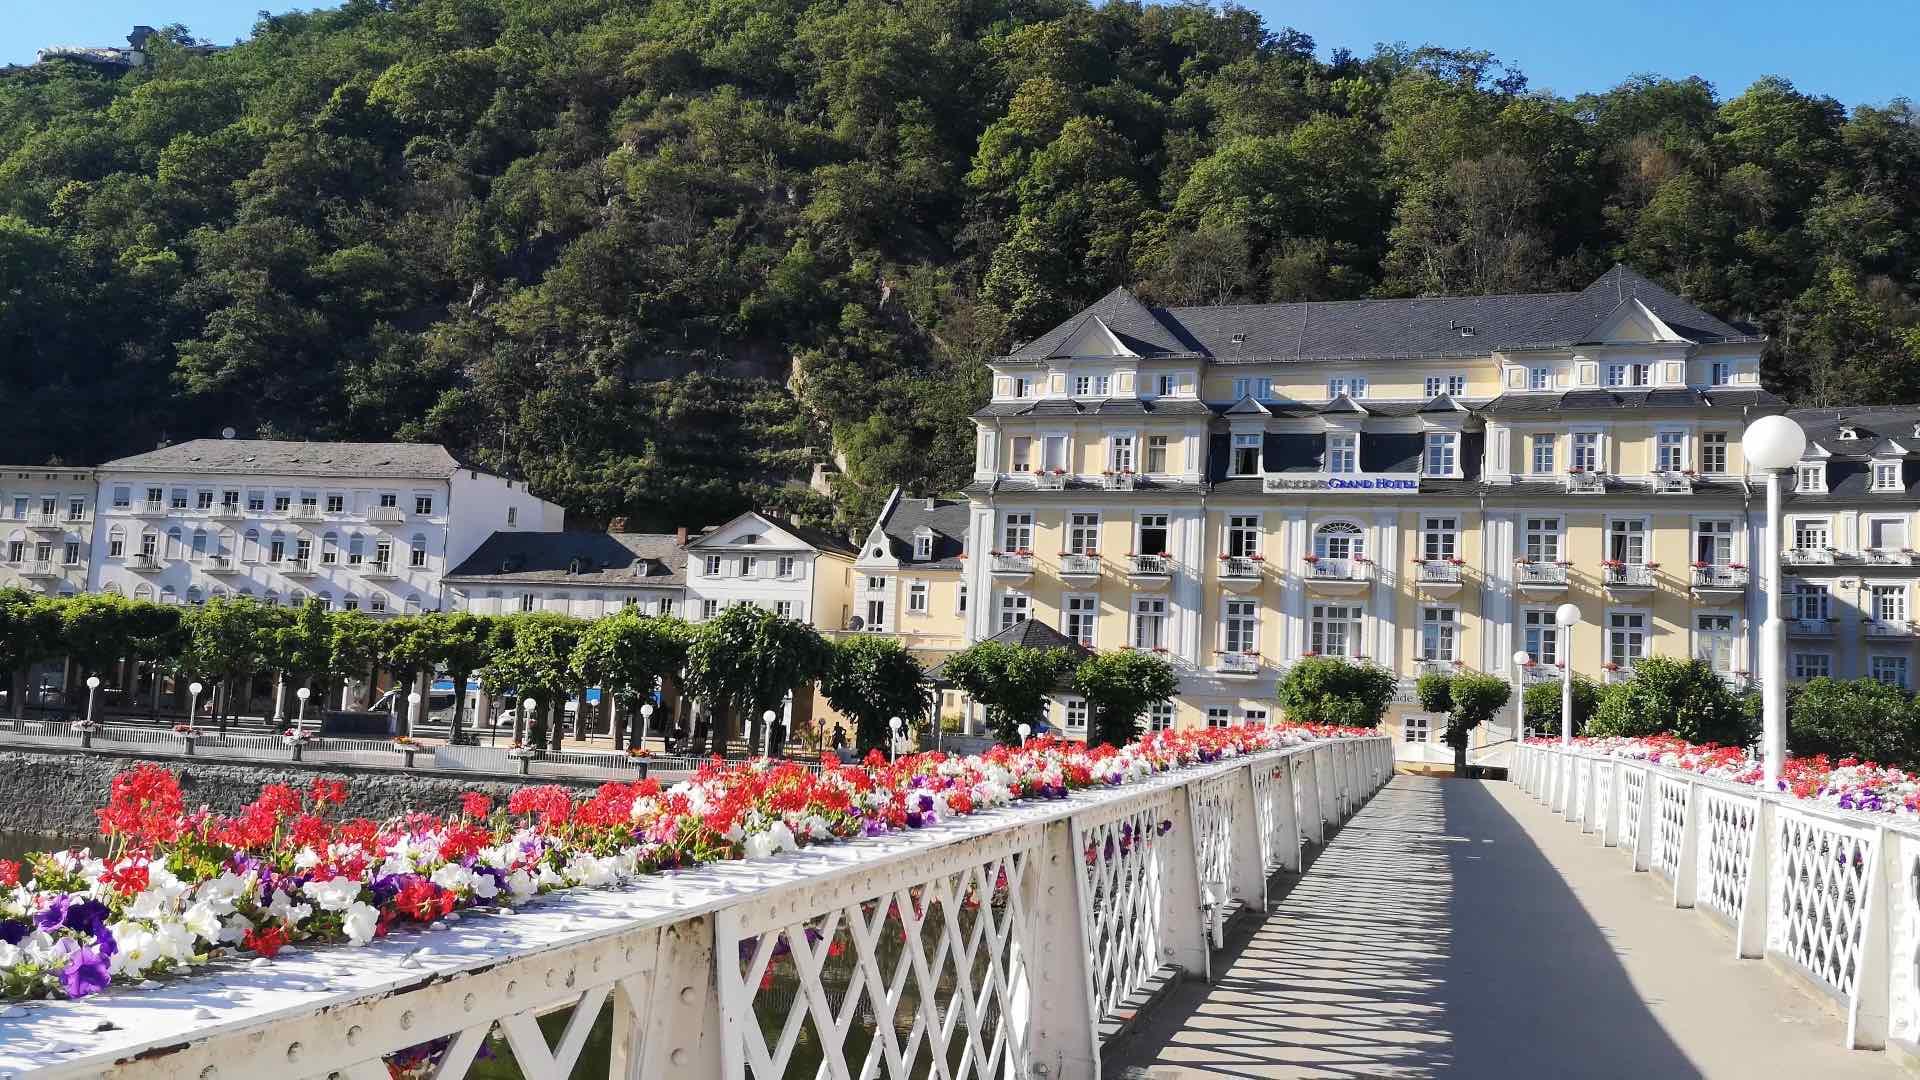 Häcker's Grand Hotel in Bad Ems